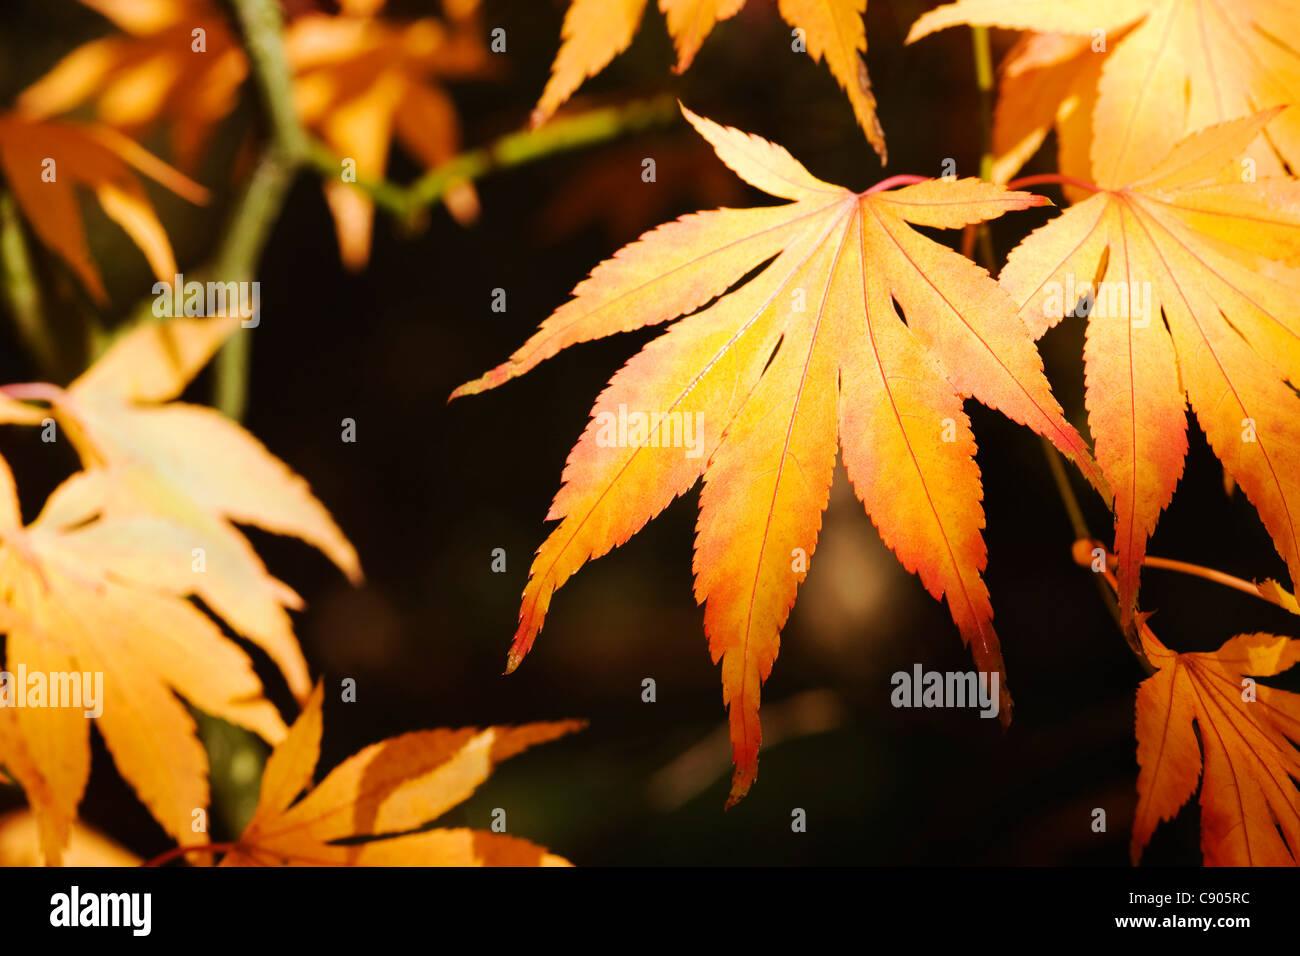 Acer palmatum. Sunlight shining on Autumn leaves. - Stock Image